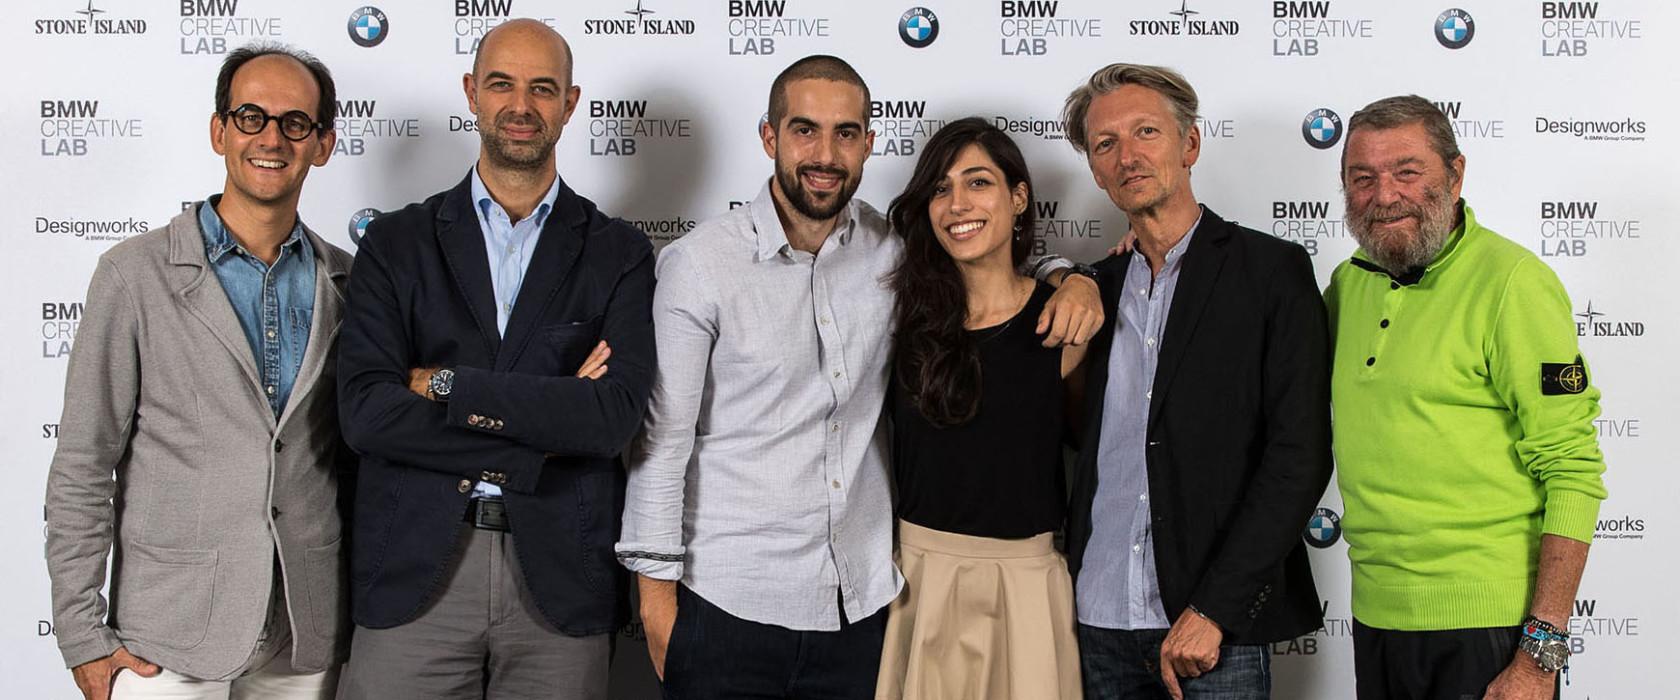 BMW Creative Lab16_160